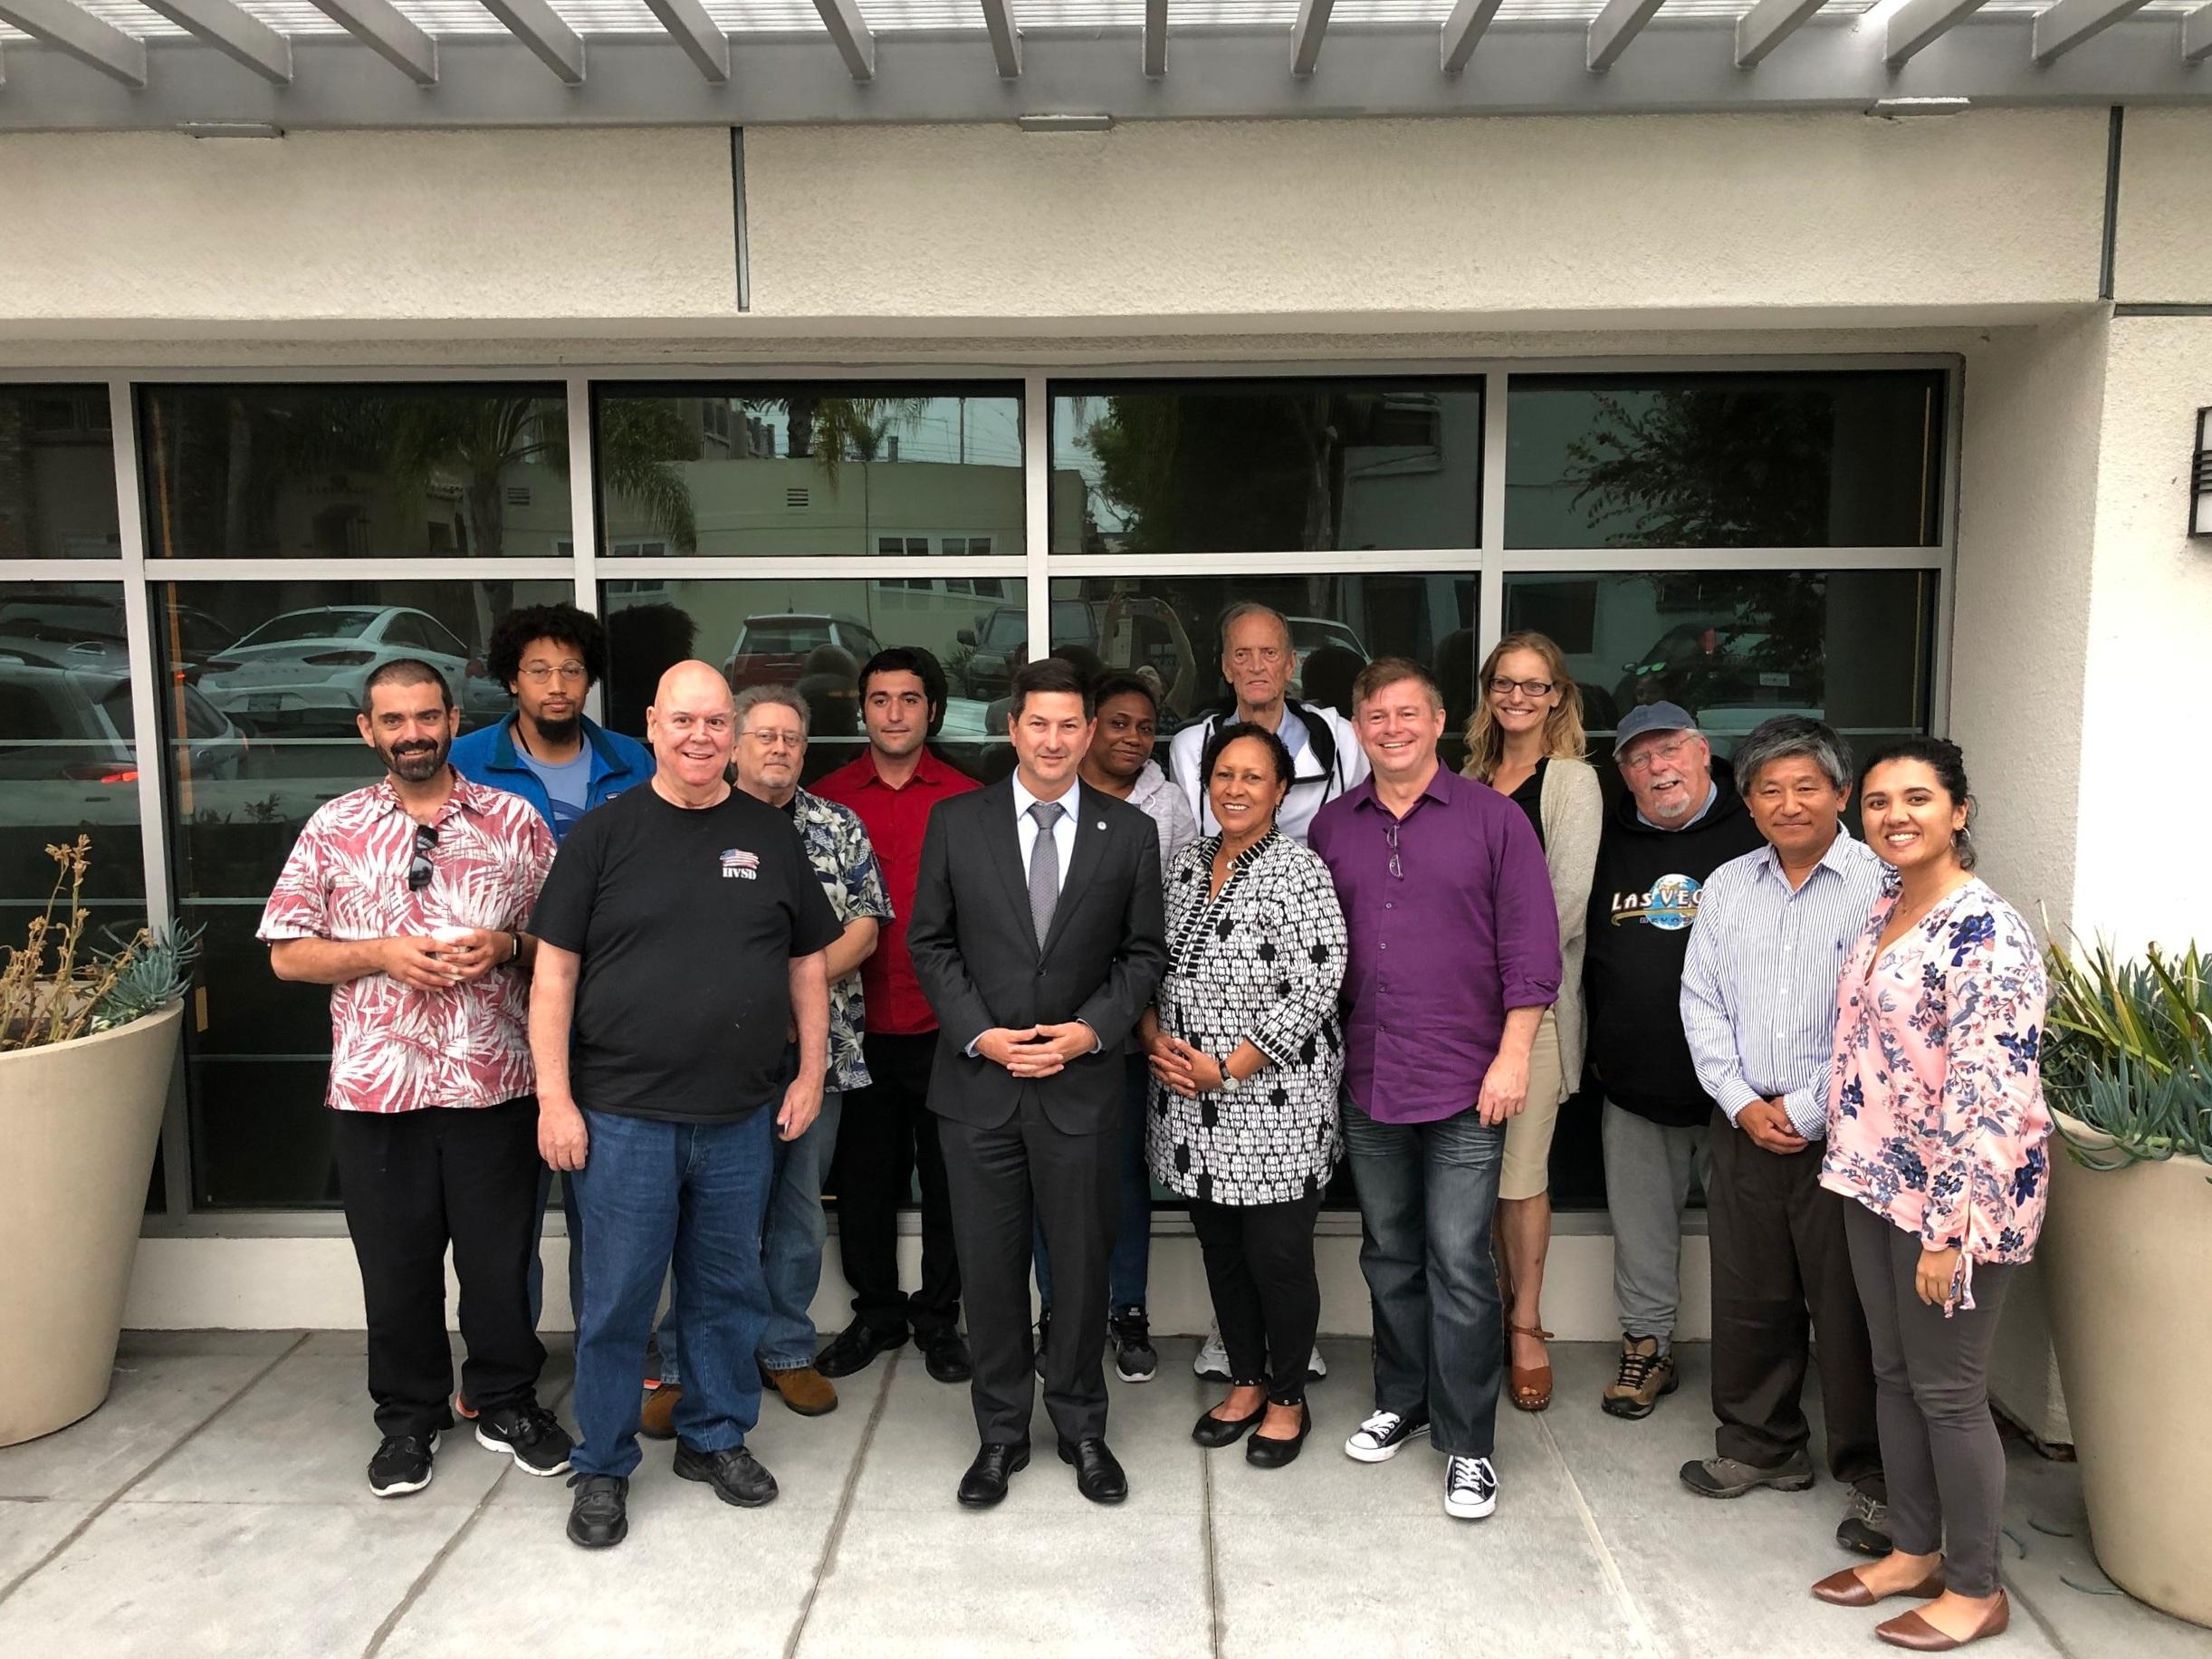 San Diego HEAL meets with Councilmember Ward, June 2019